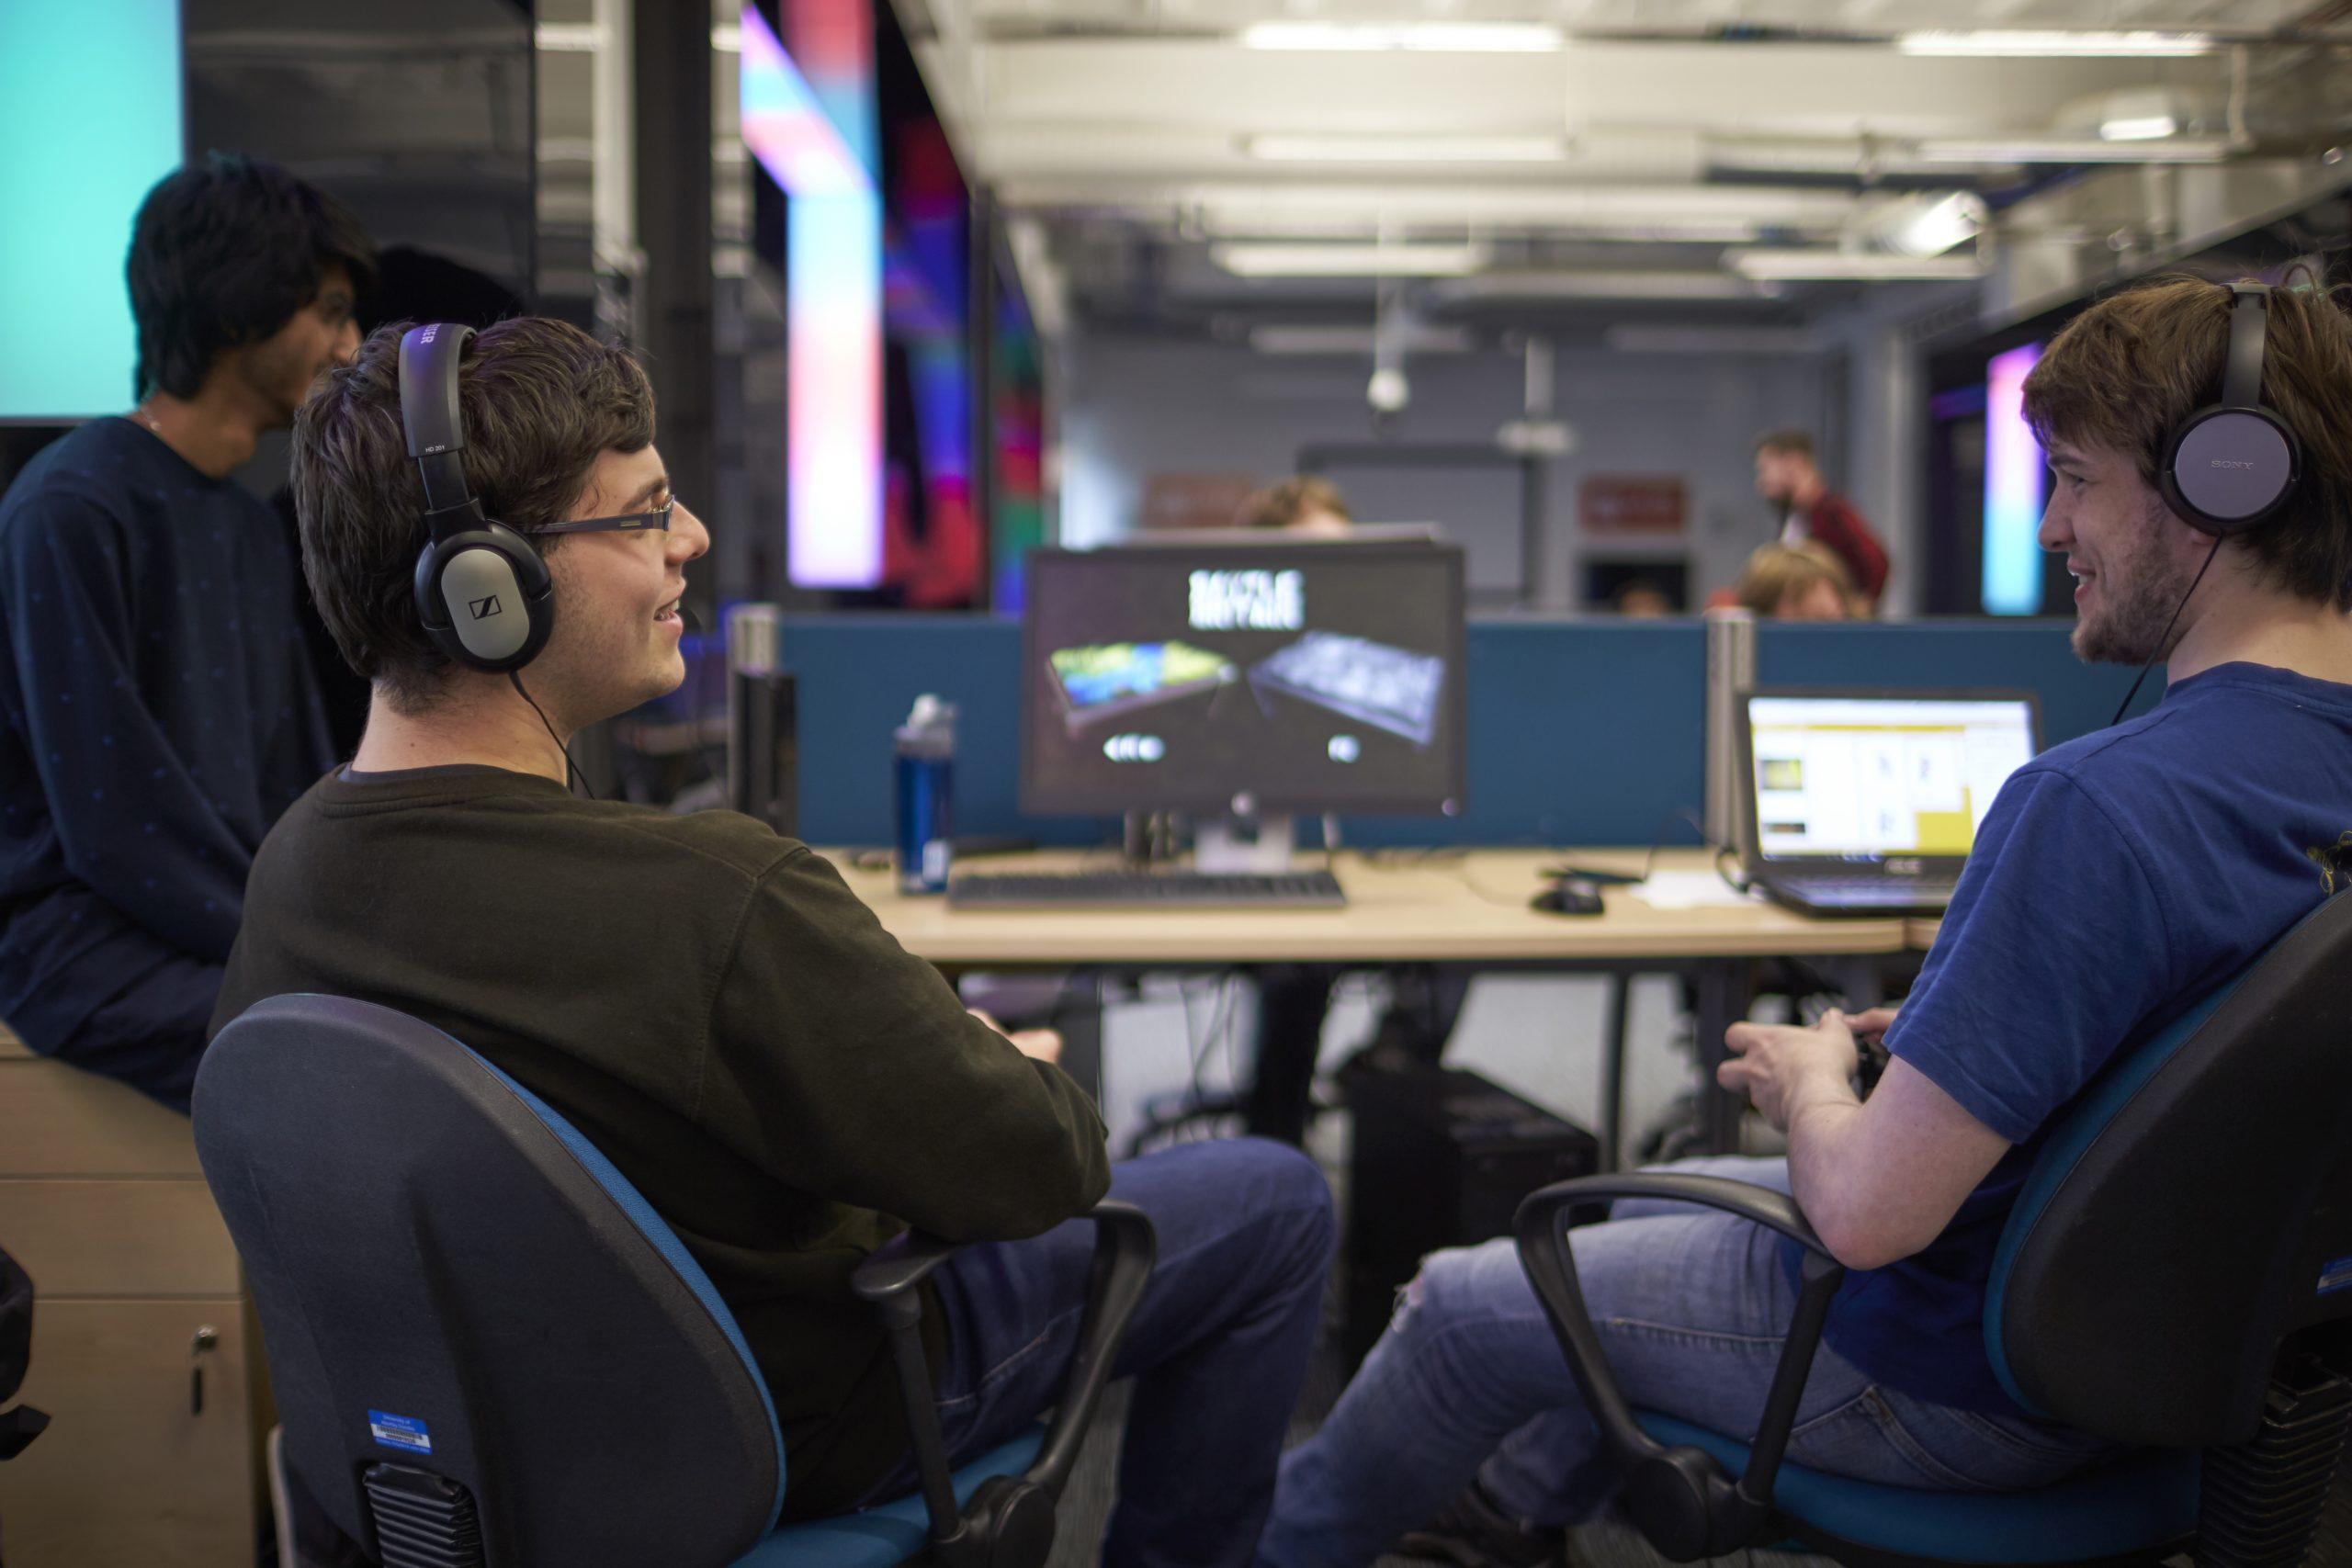 Computing students - Education News Scotland